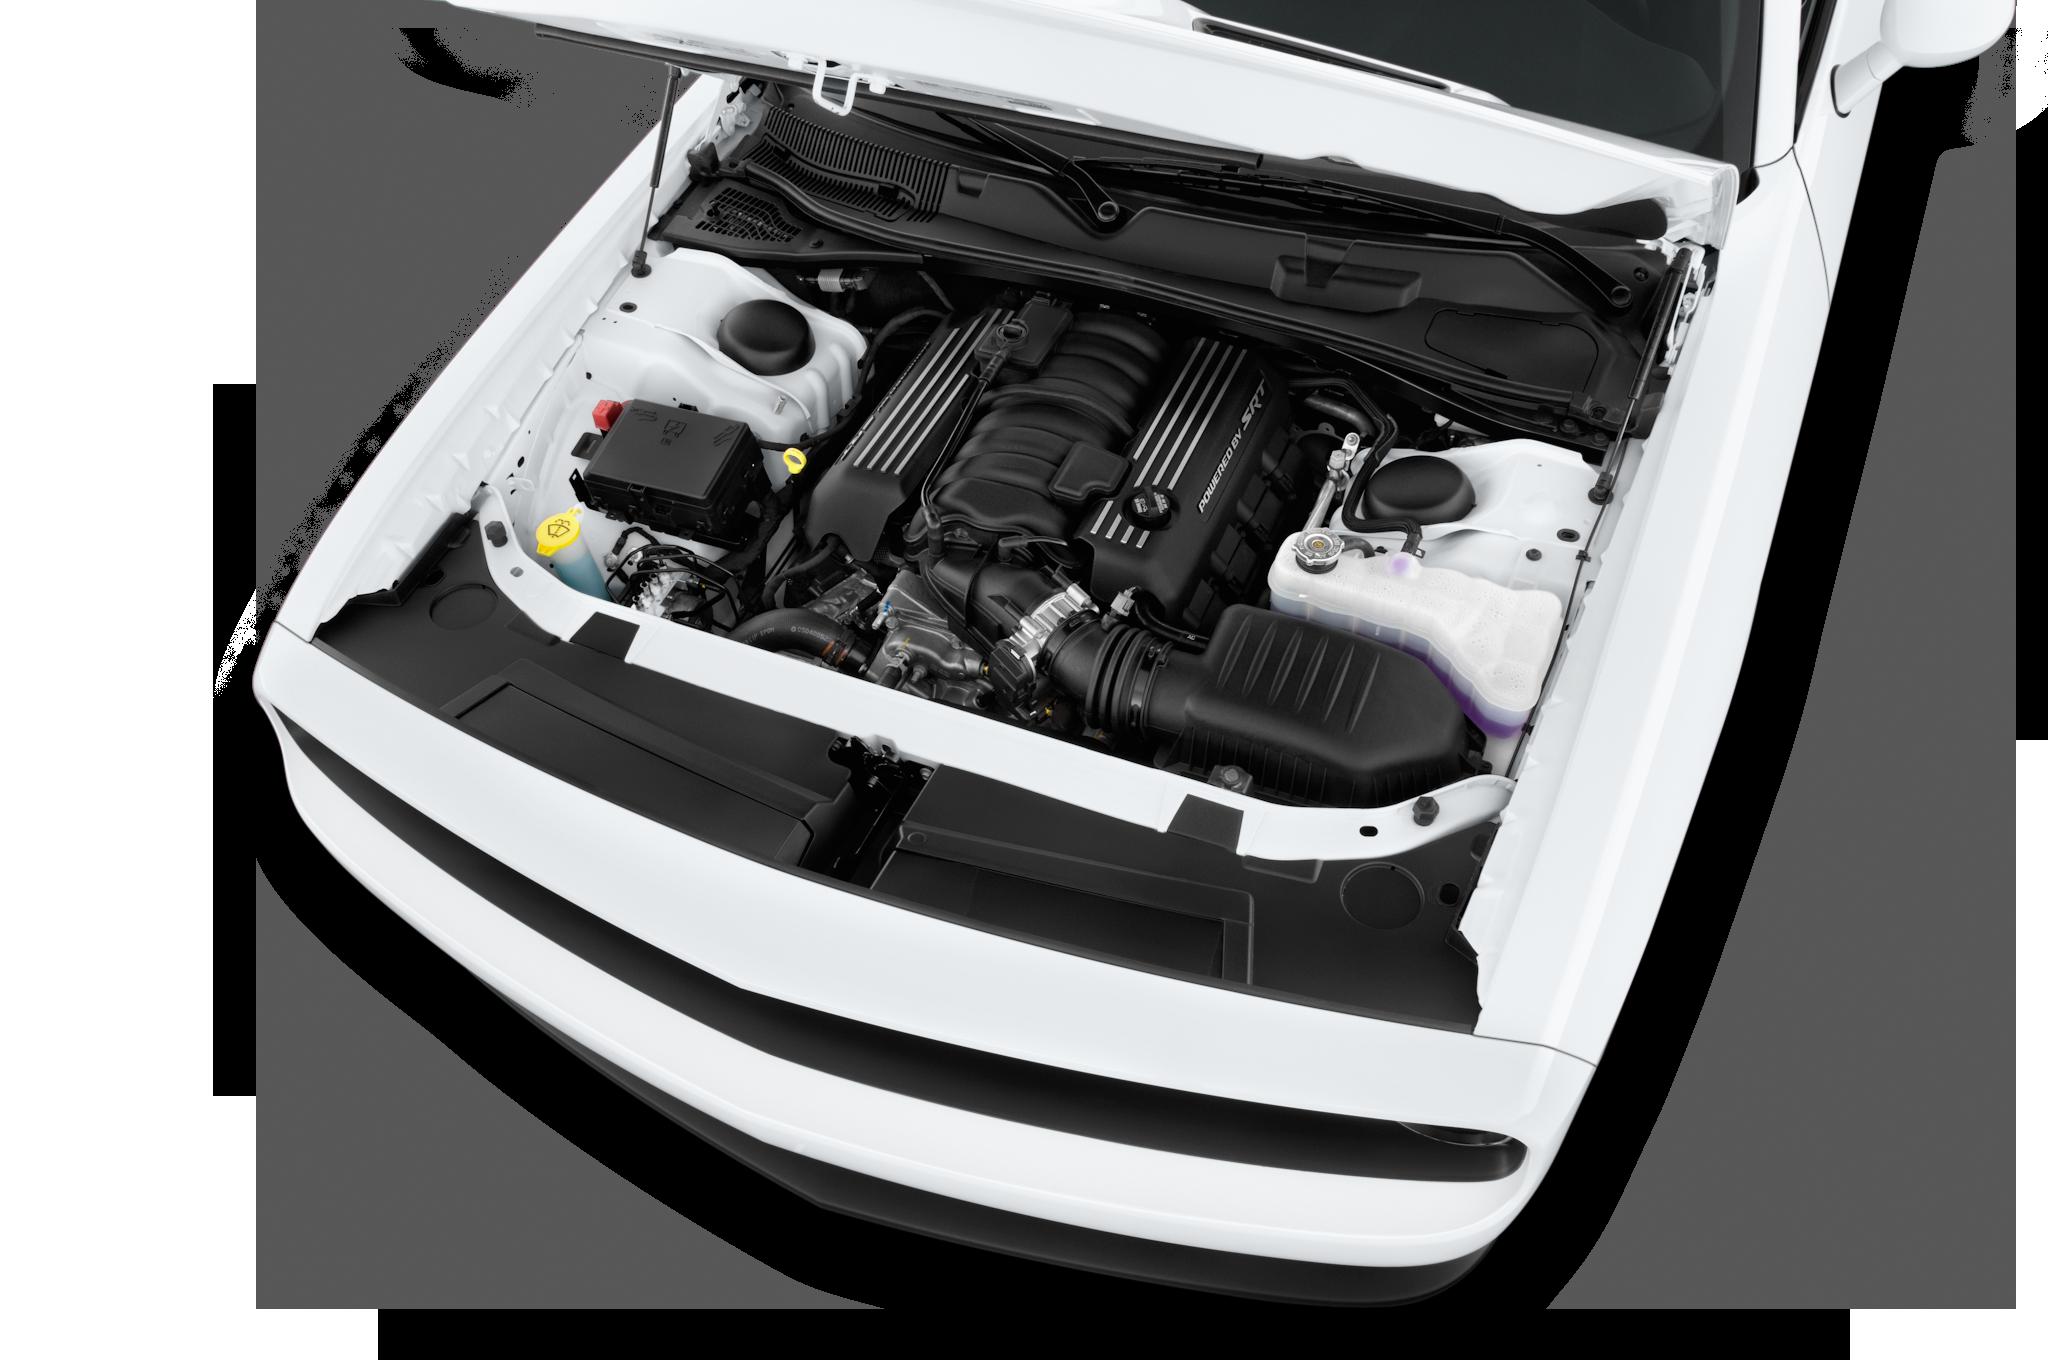 Mopar's Hellcrate is a 6 2-Liter Supercharged HEMI Engine